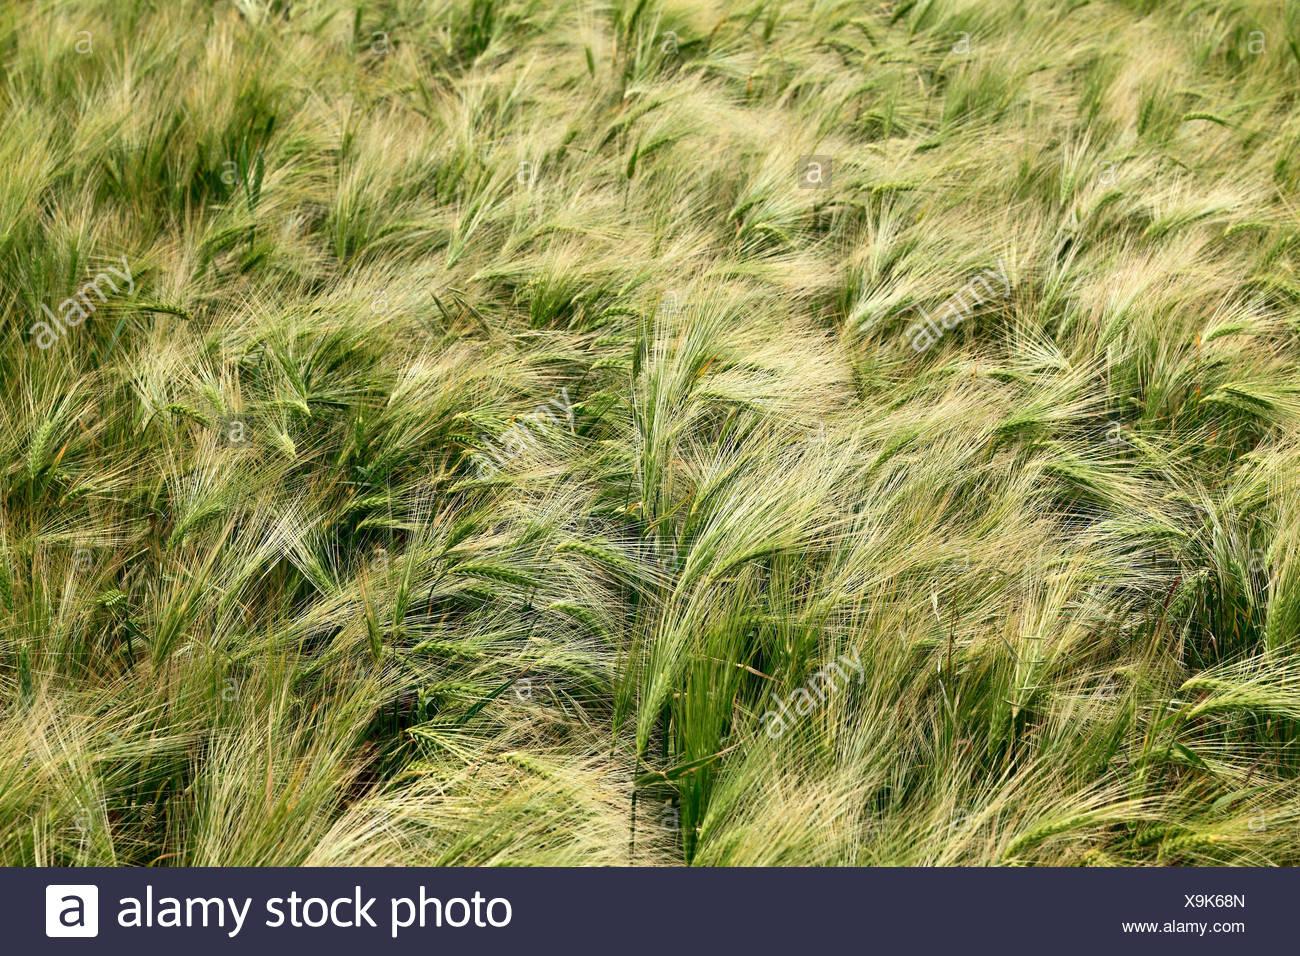 Barley Field, Hordeum vulgare, agriculture crop fields England UK - Stock Image